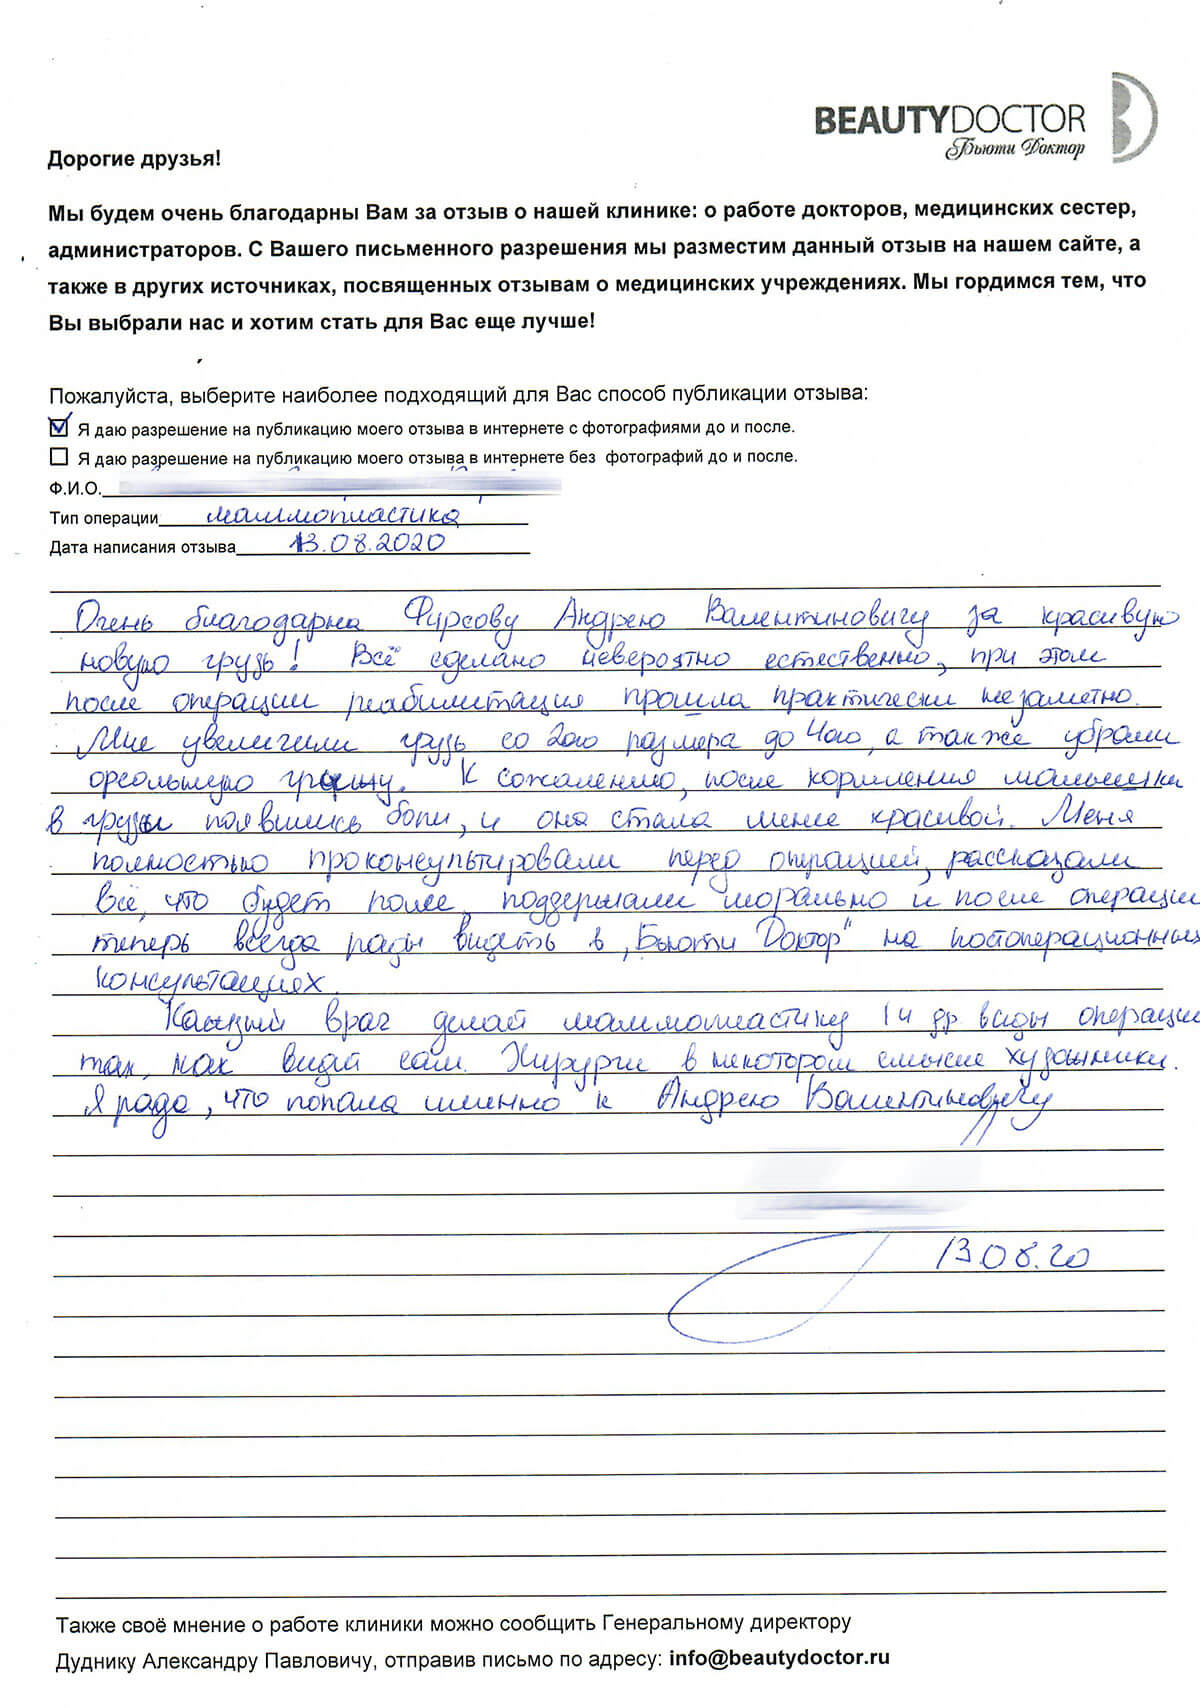 Отзыв о маммопластике, хирург Фирсов